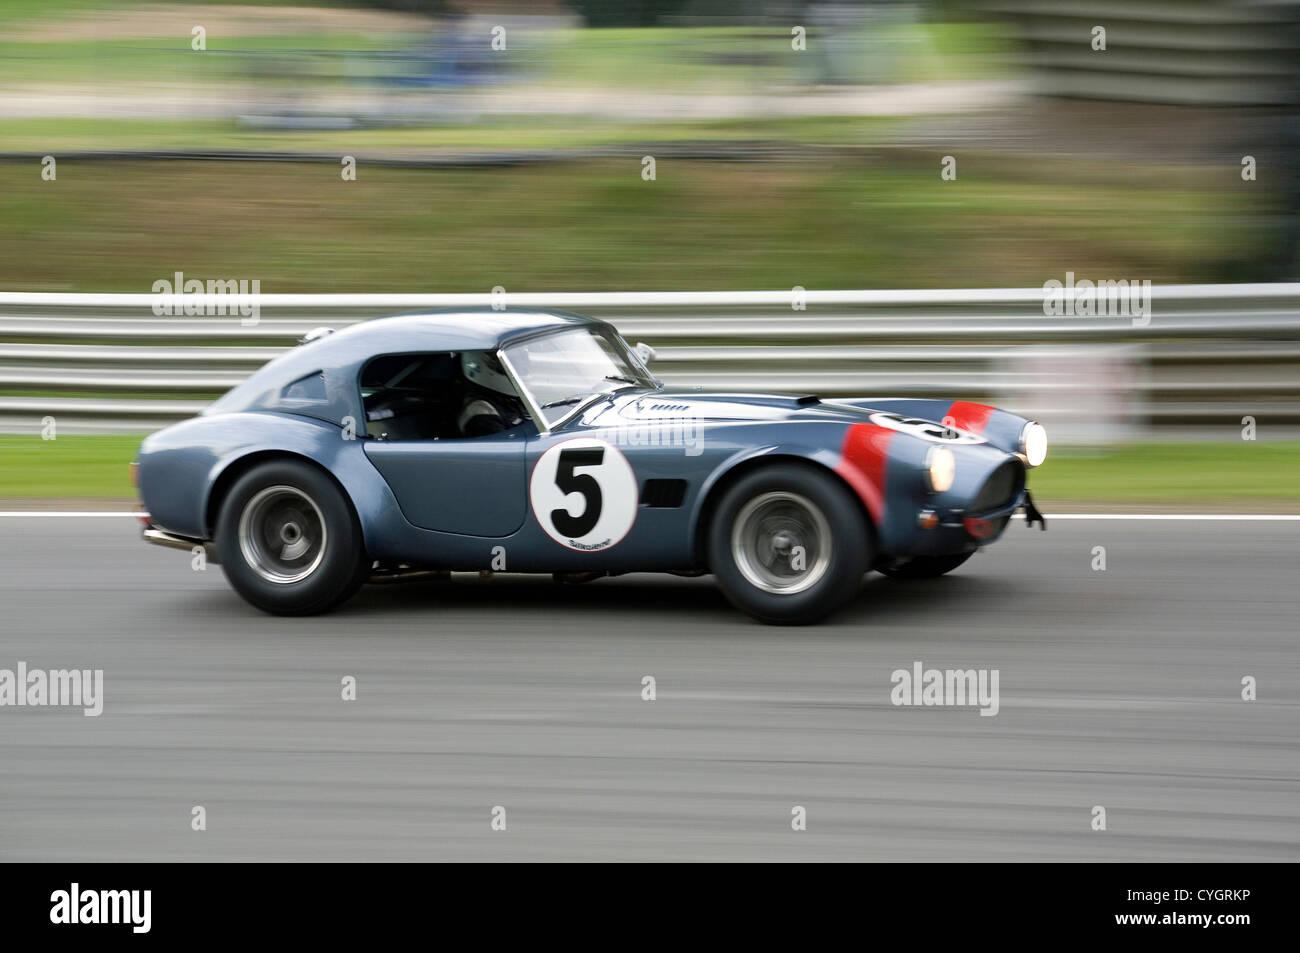 An Ac Cobra Hardtop Classic Racing Car Traveling Fast On A